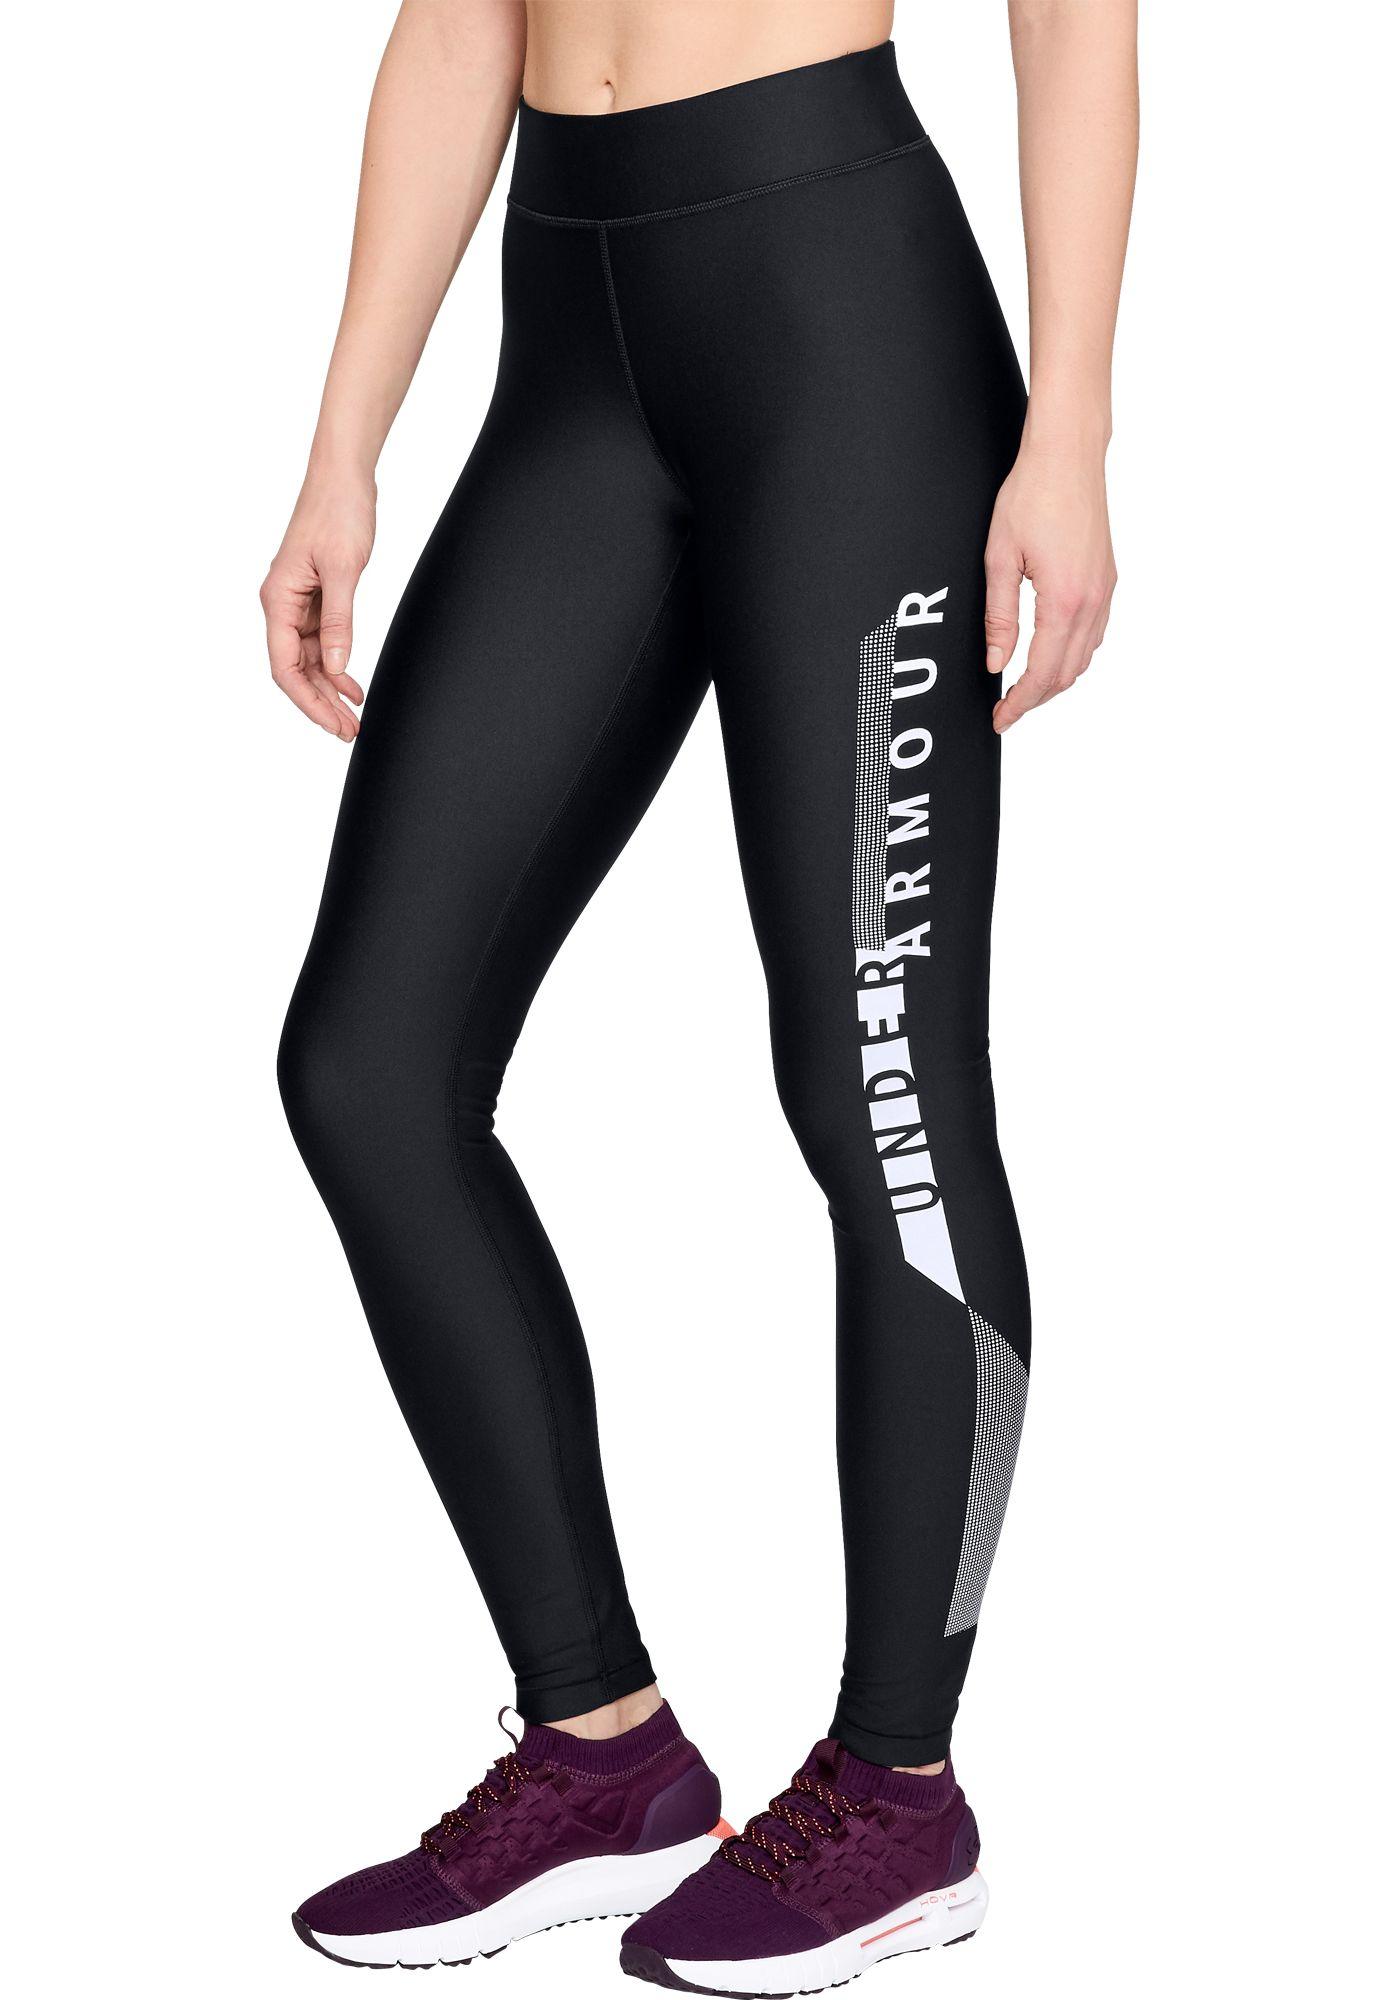 Under Armour Women's HeatGear Graphic Compression Leggings